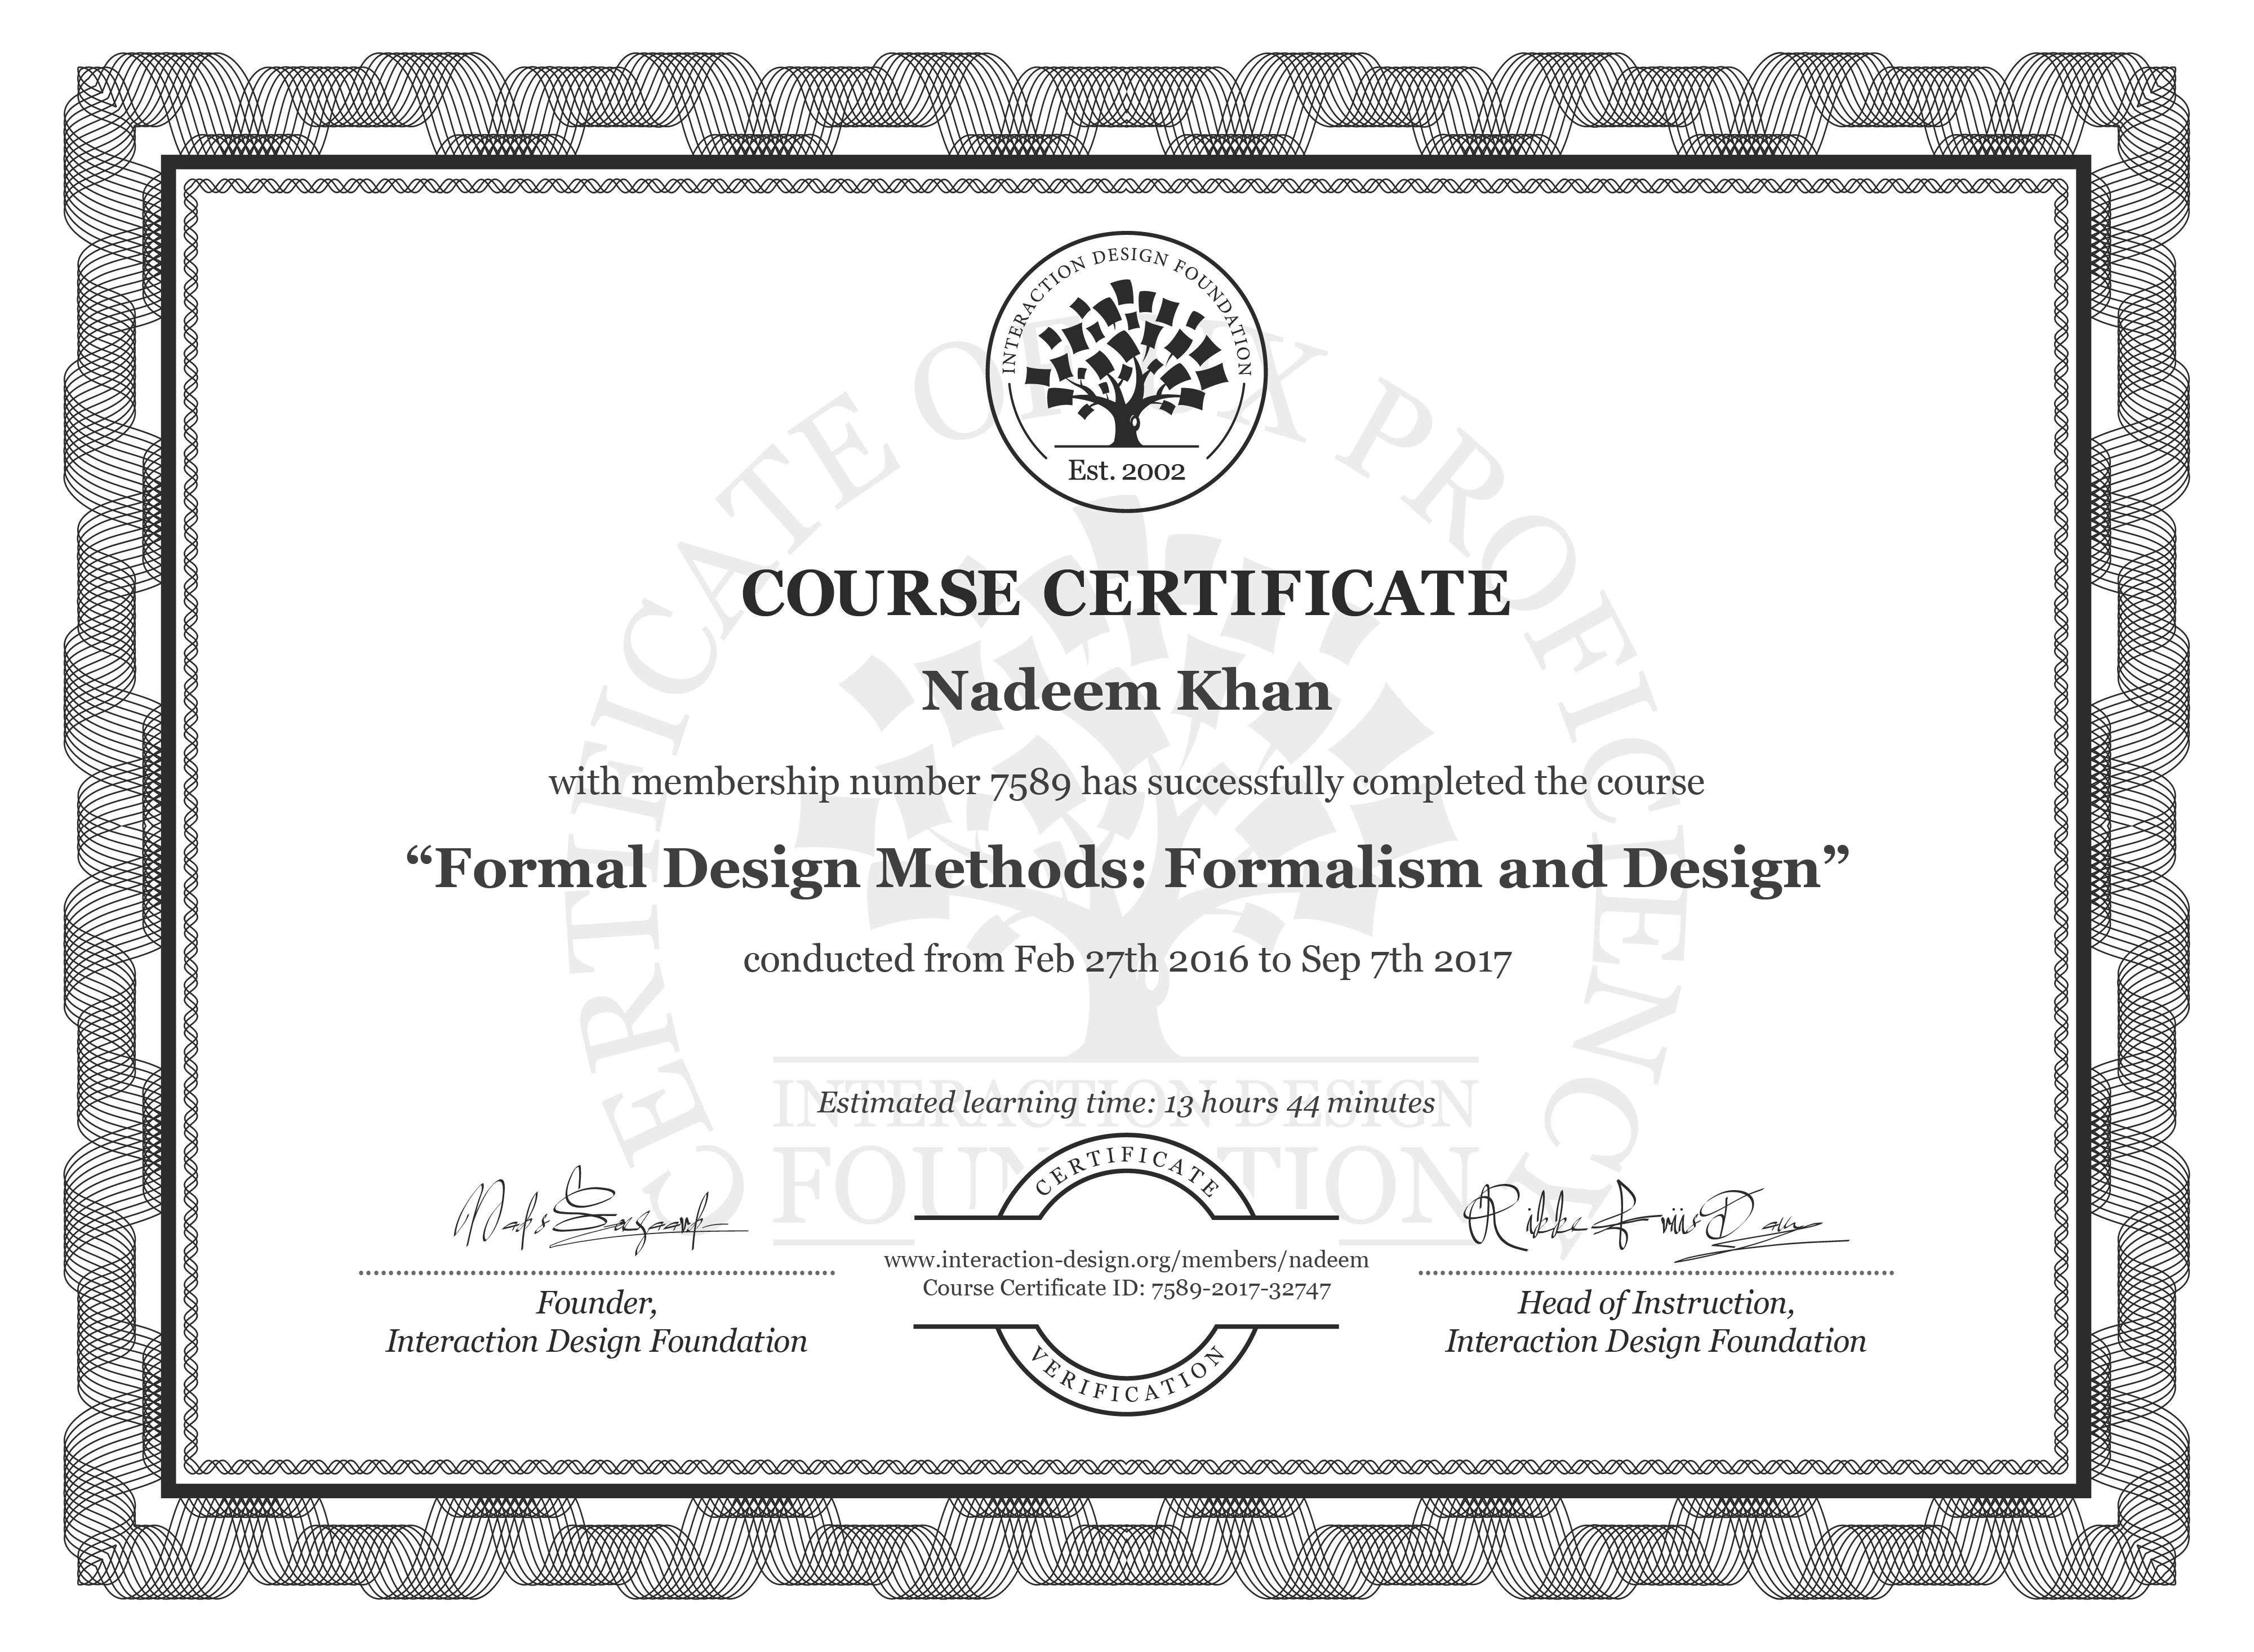 Nadeem Khan's Course Certificate: Formal Design Methods: Formalism and Design